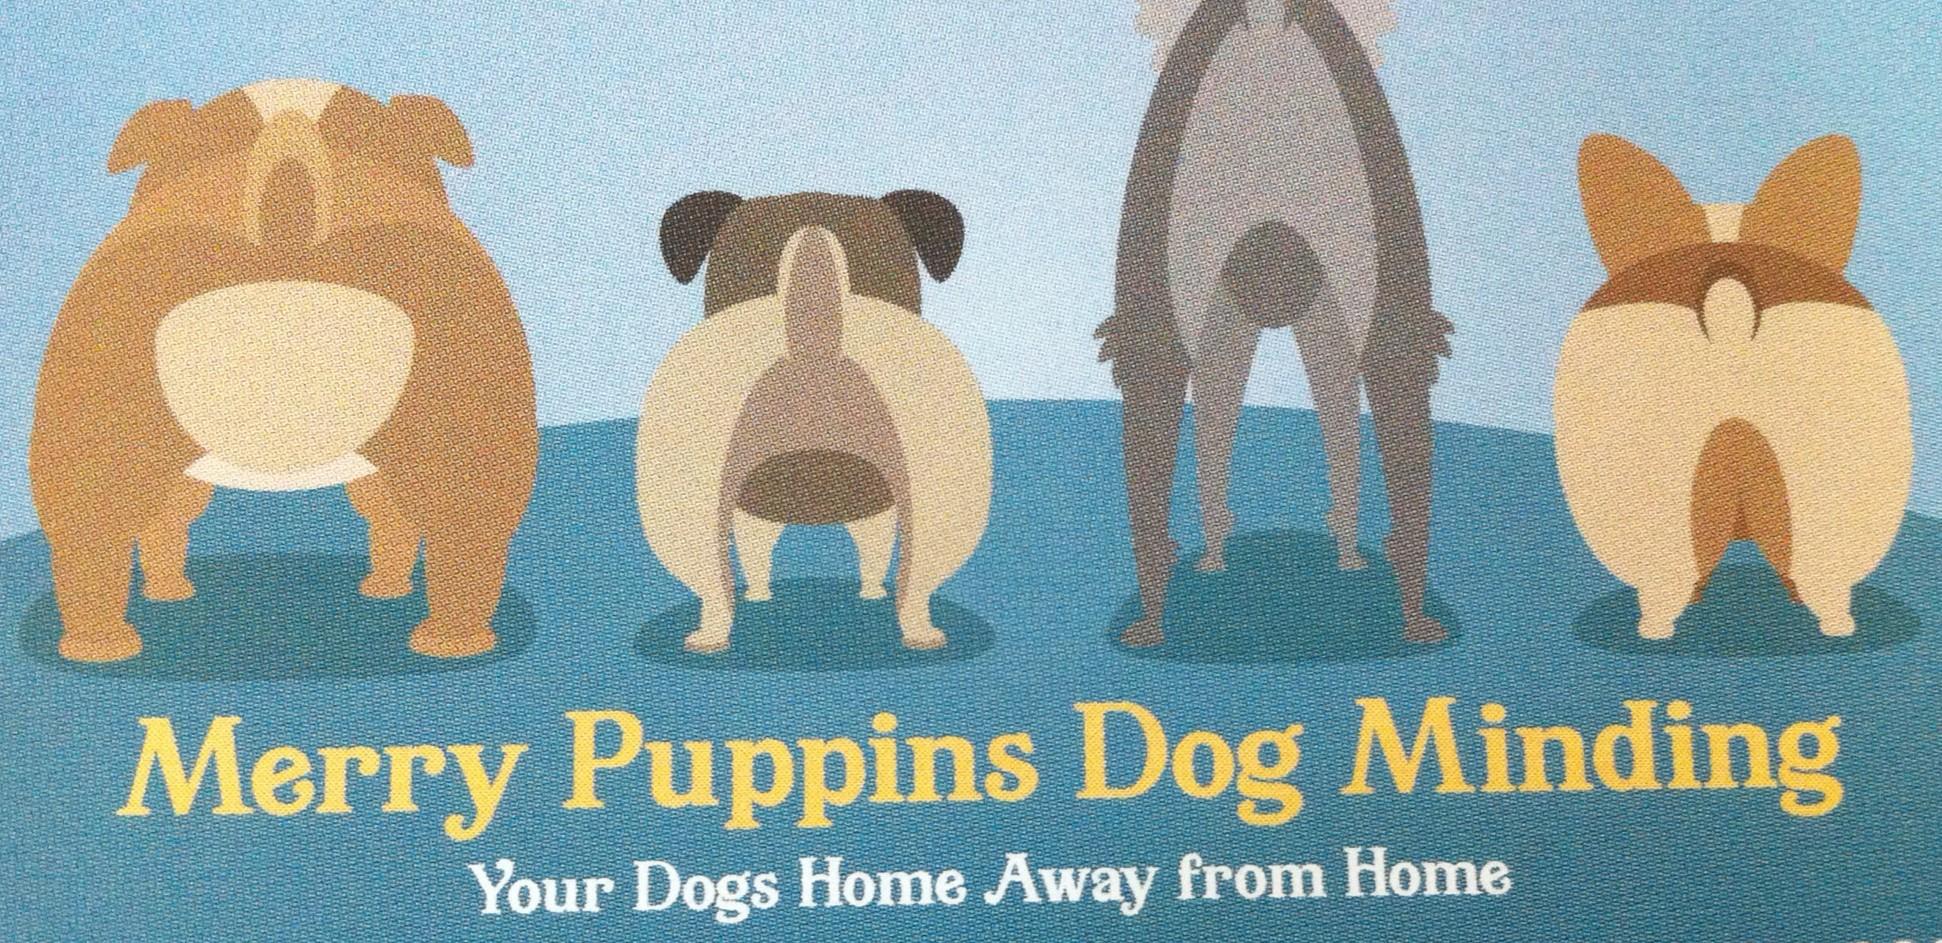 Merry Puppins Dog Minding